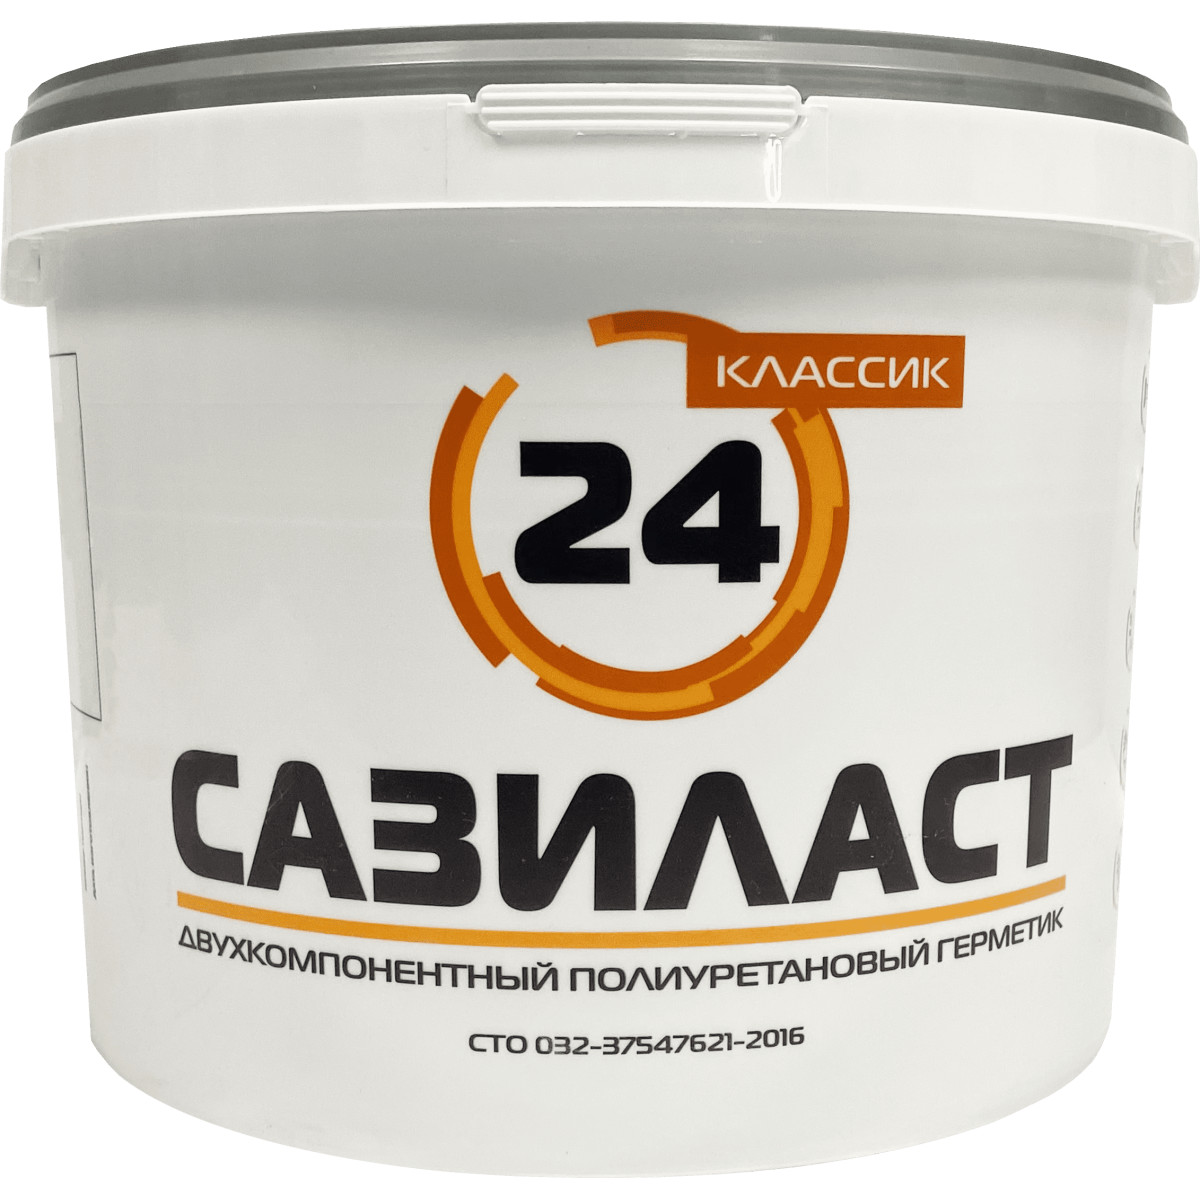 Герметик для швов Сазиласт цвет серый 16.5 кг